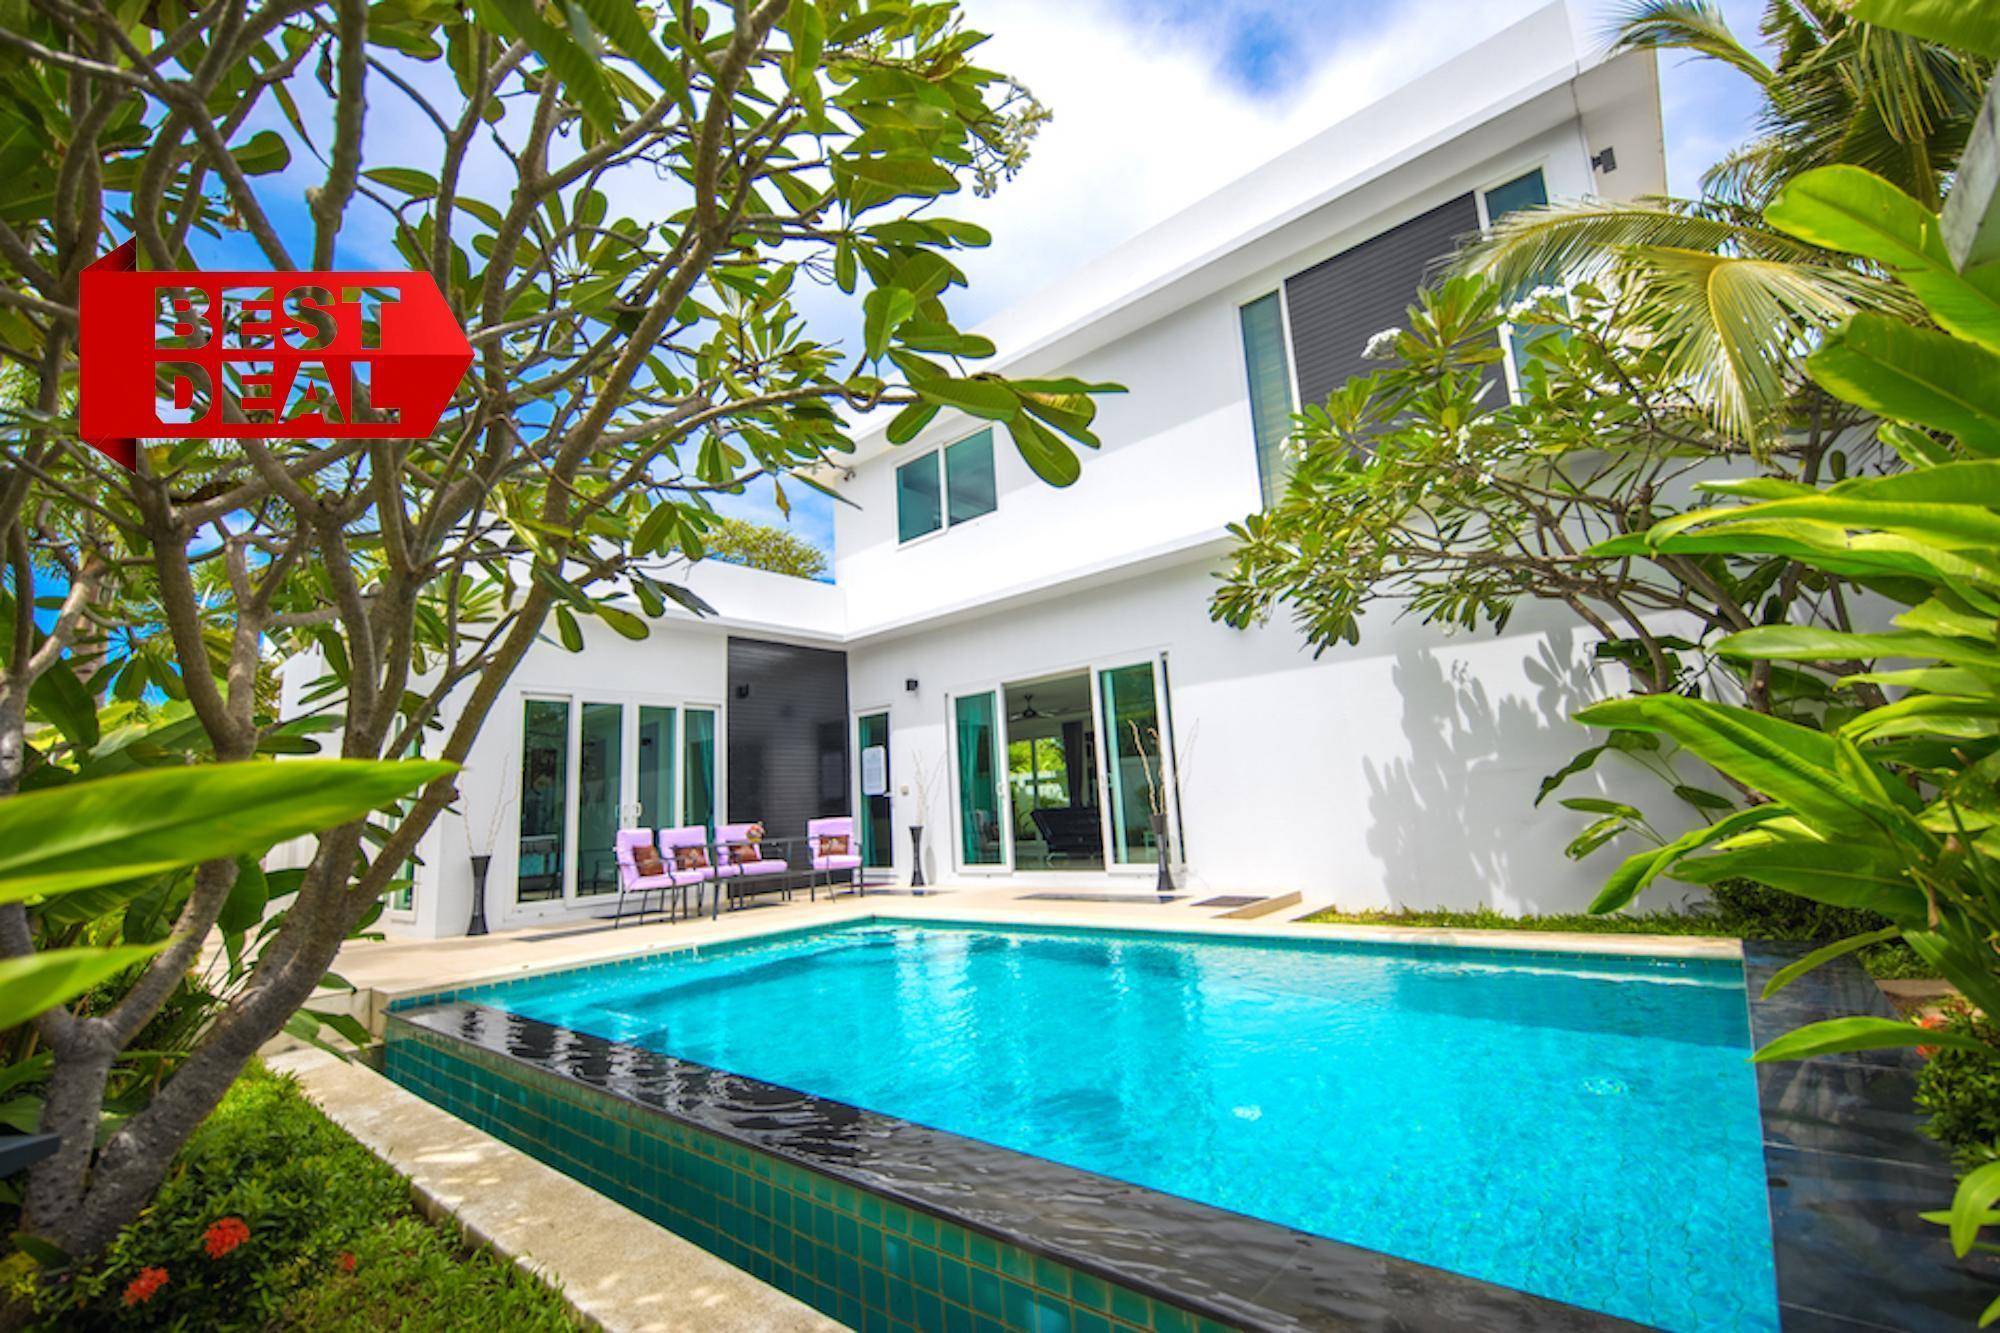 HOLLYWOOD Pool Villa 3 bedroom Palm Oasis Village วิลลา 3 ห้องนอน 2 ห้องน้ำส่วนตัว ขนาด 260 ตร.ม. – หาดจอมเทียน